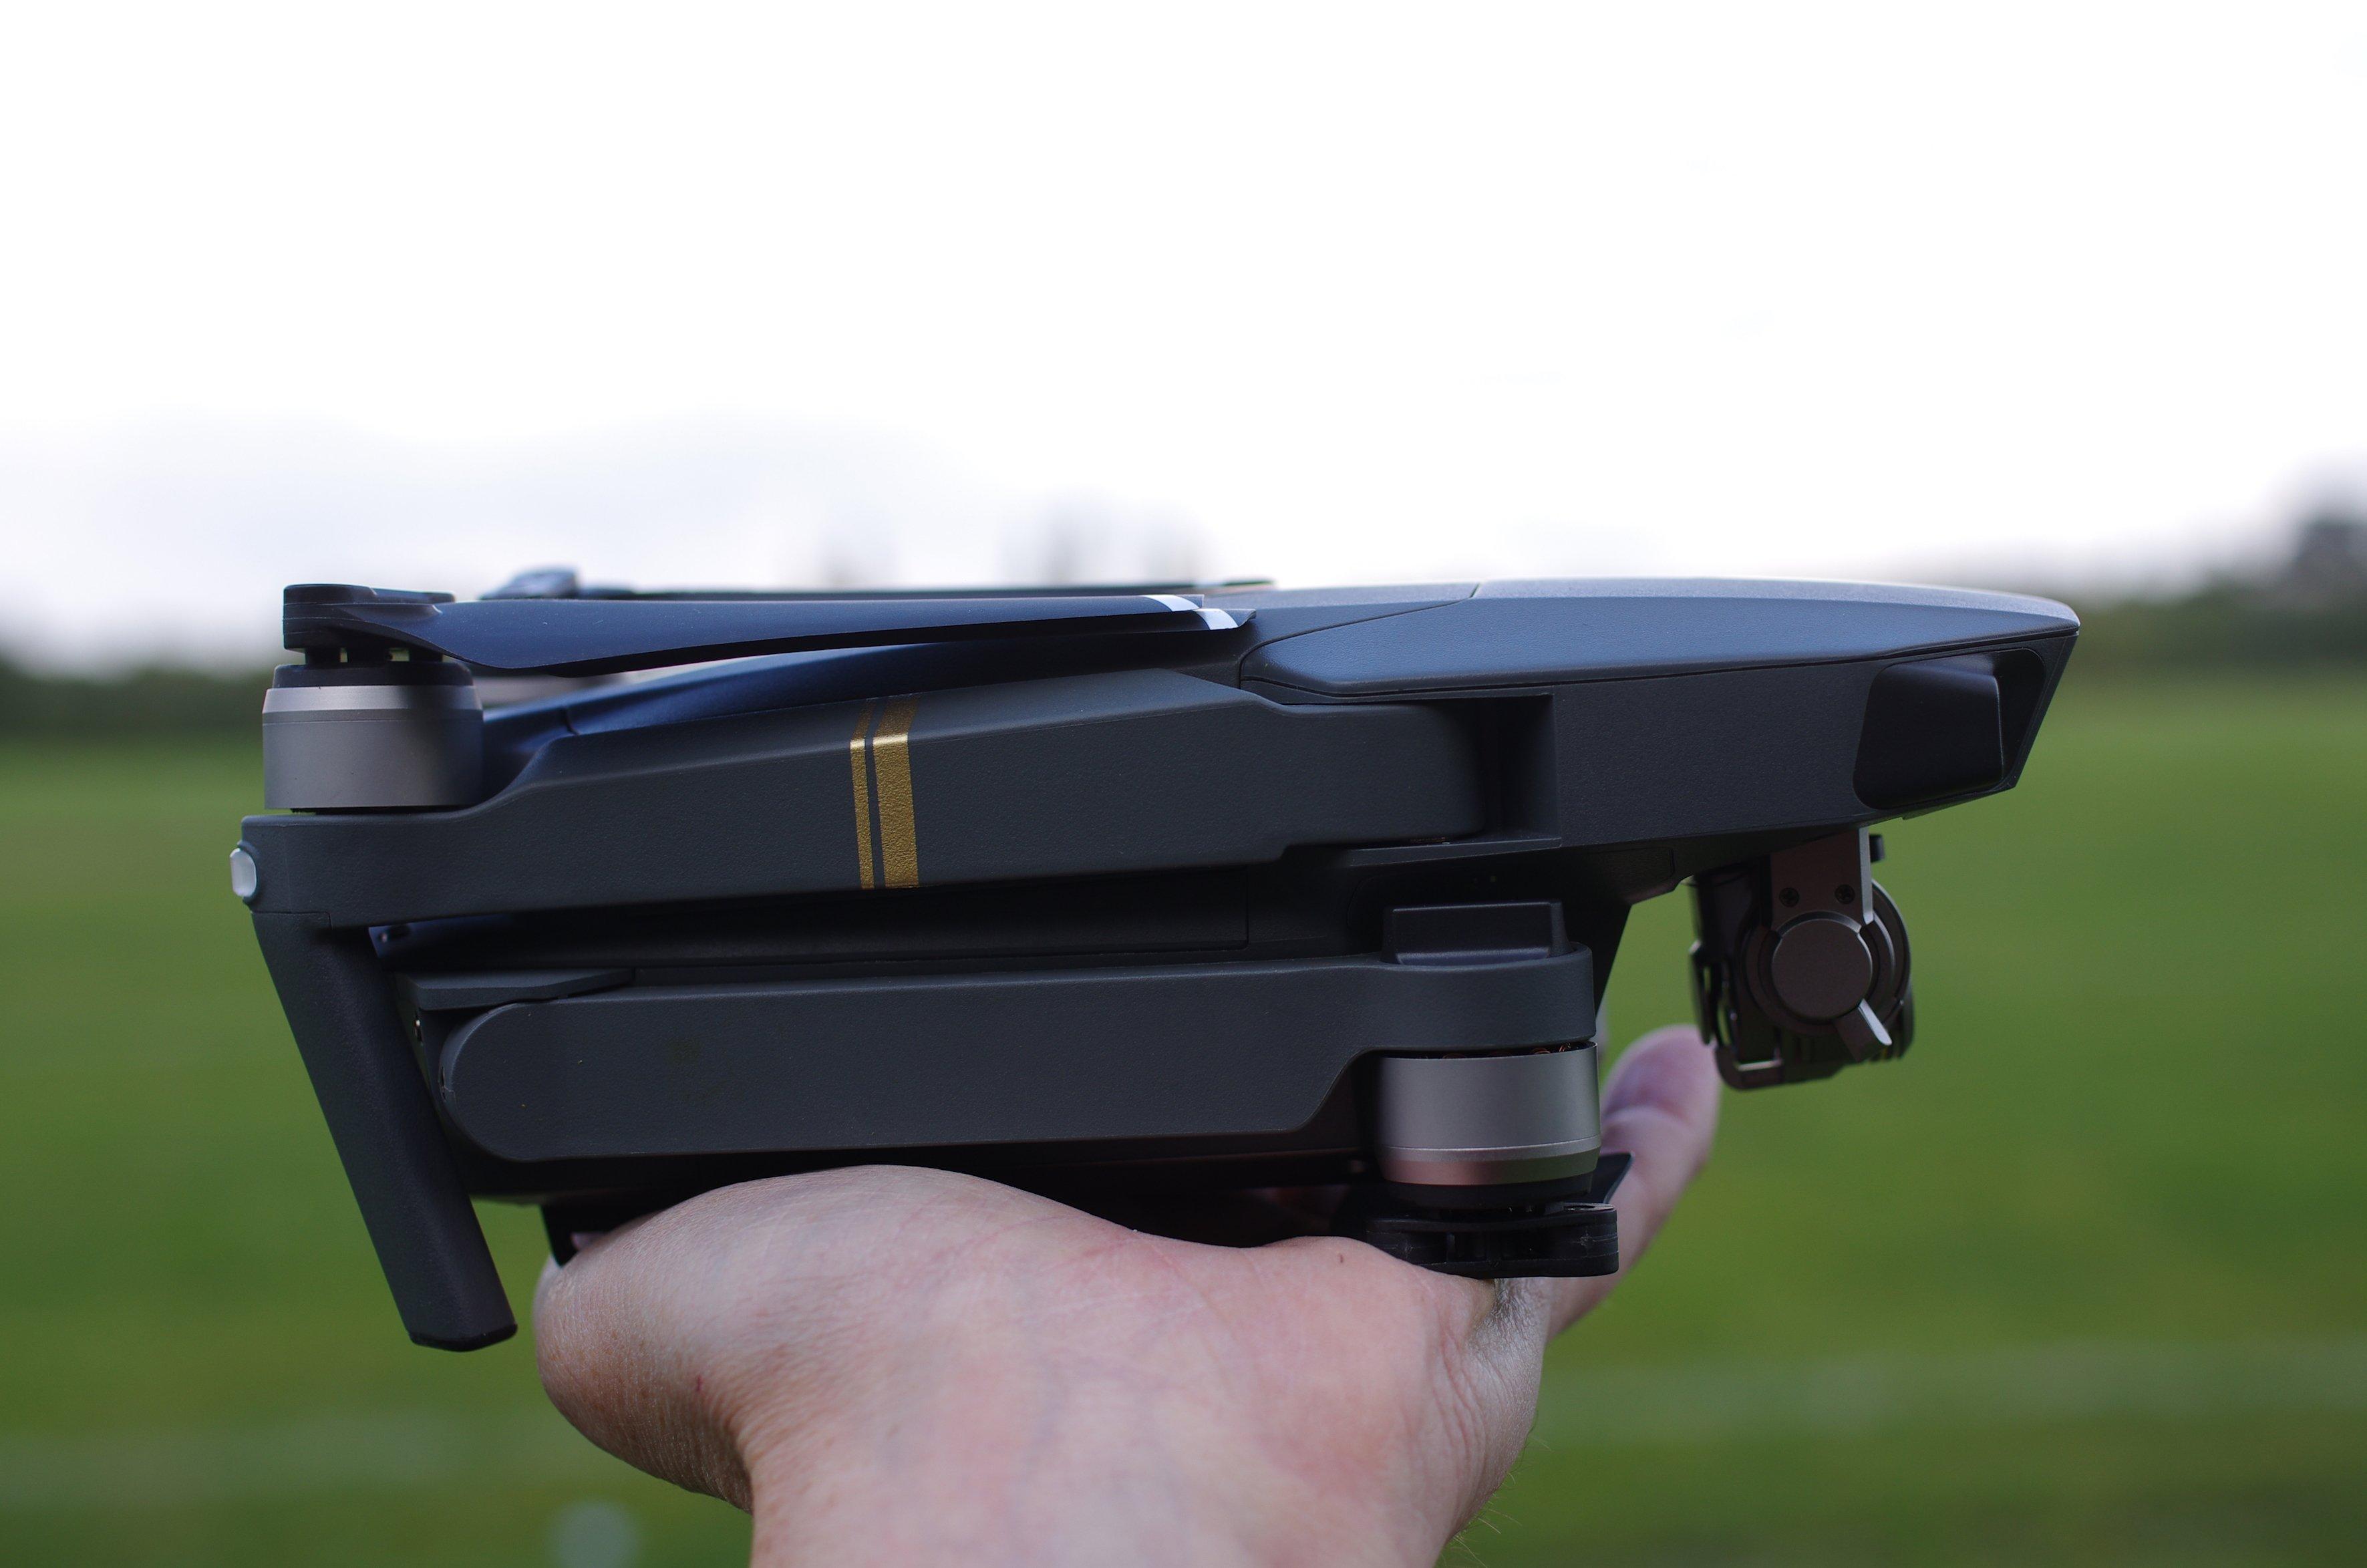 Dji Mavic Pro Review A Superb Folding Drone But No Longer